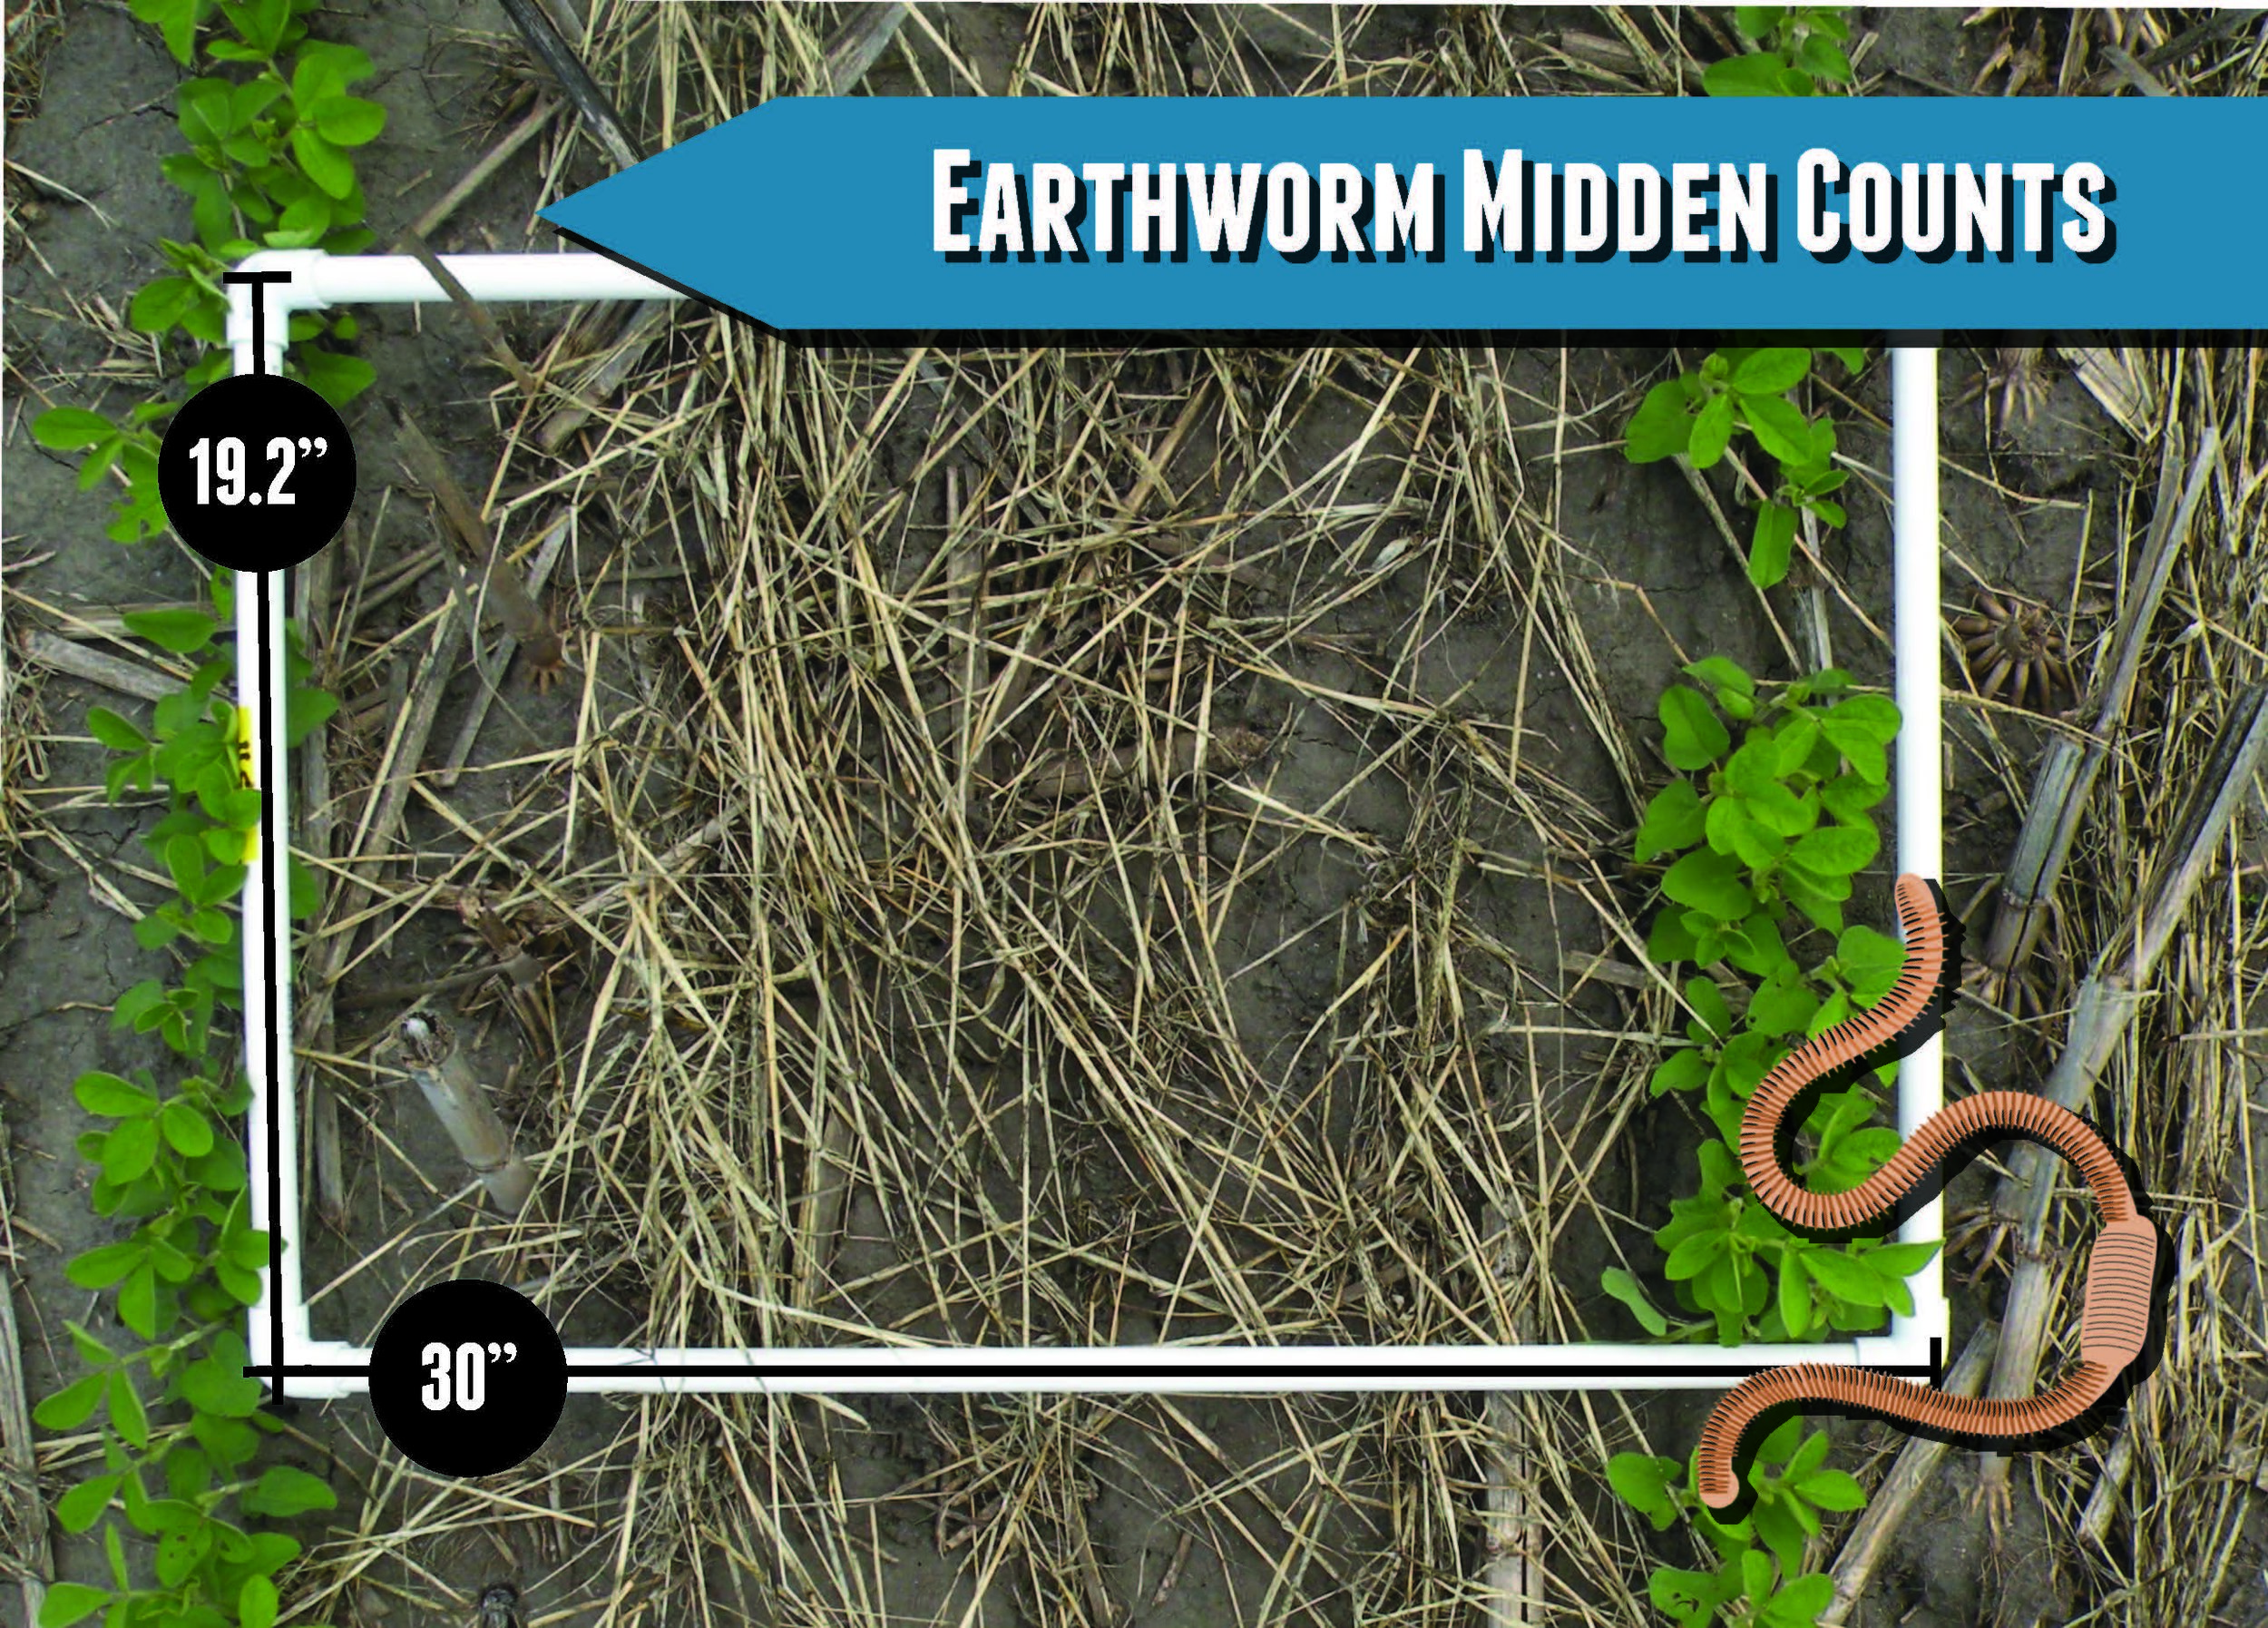 EarthwormMiddenPostcard_Page_2.jpg